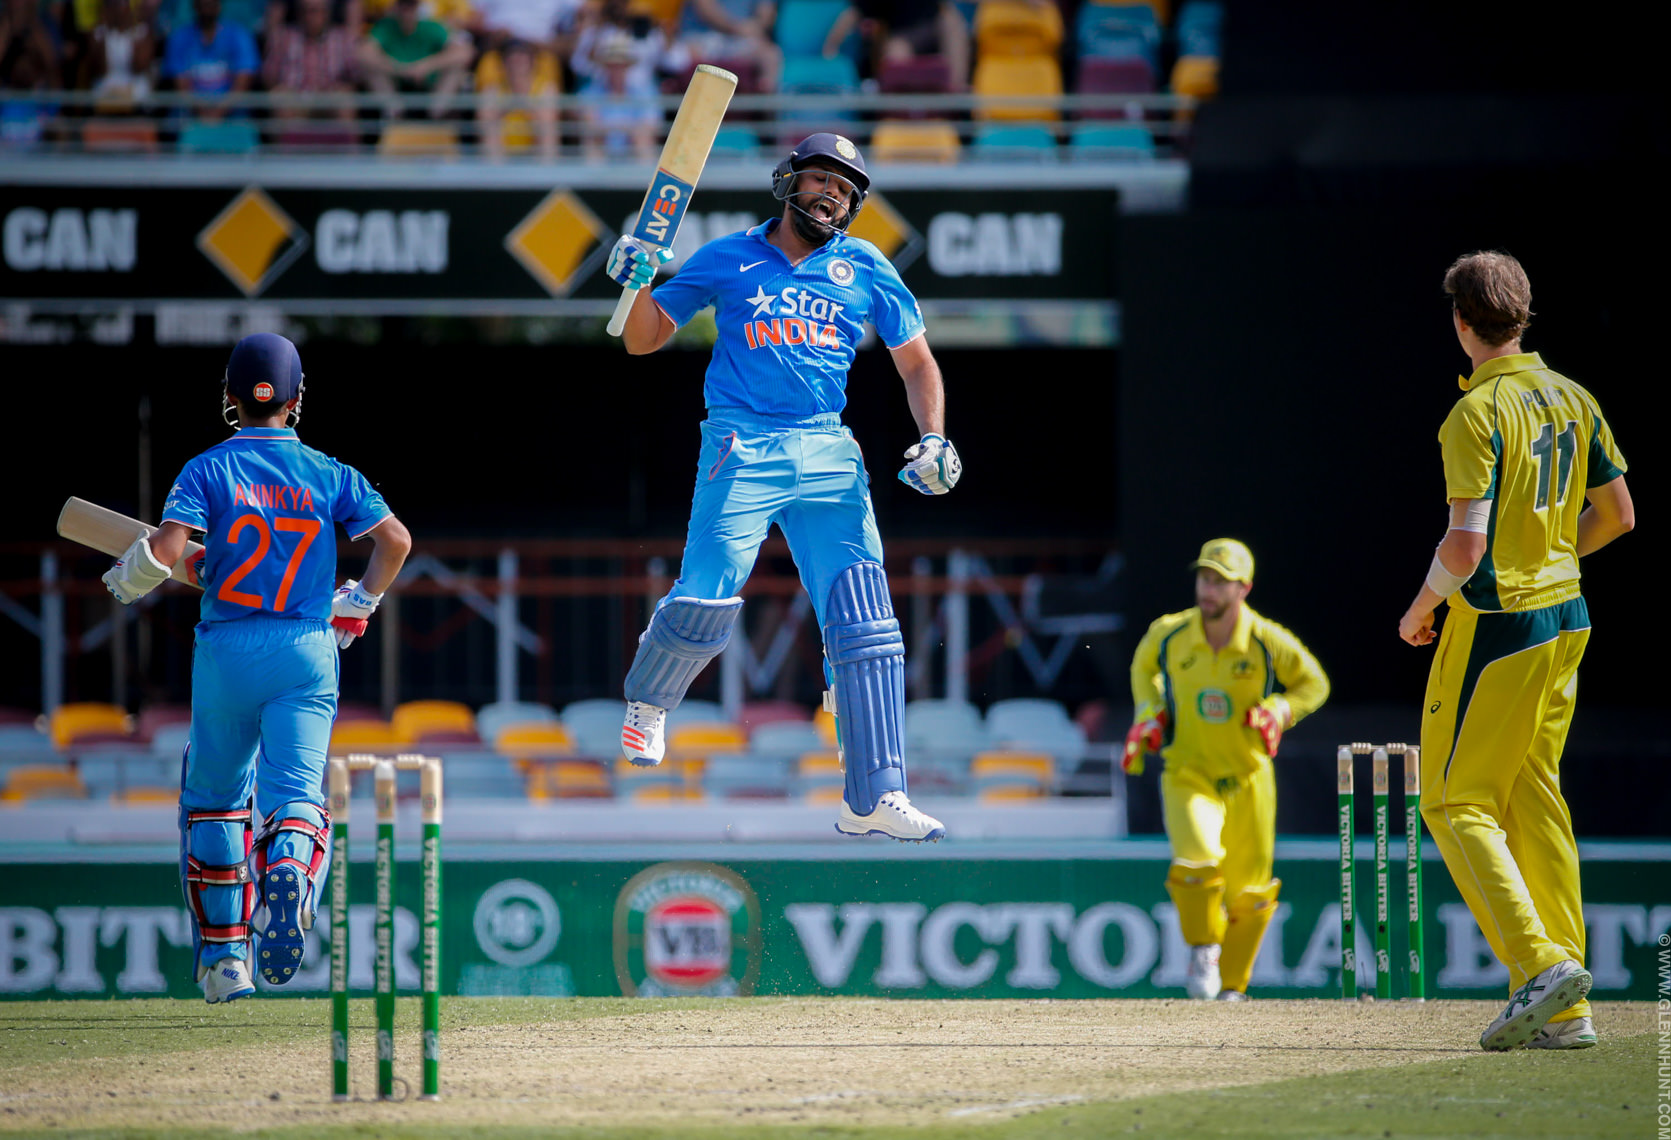 Sports Photographers Australia